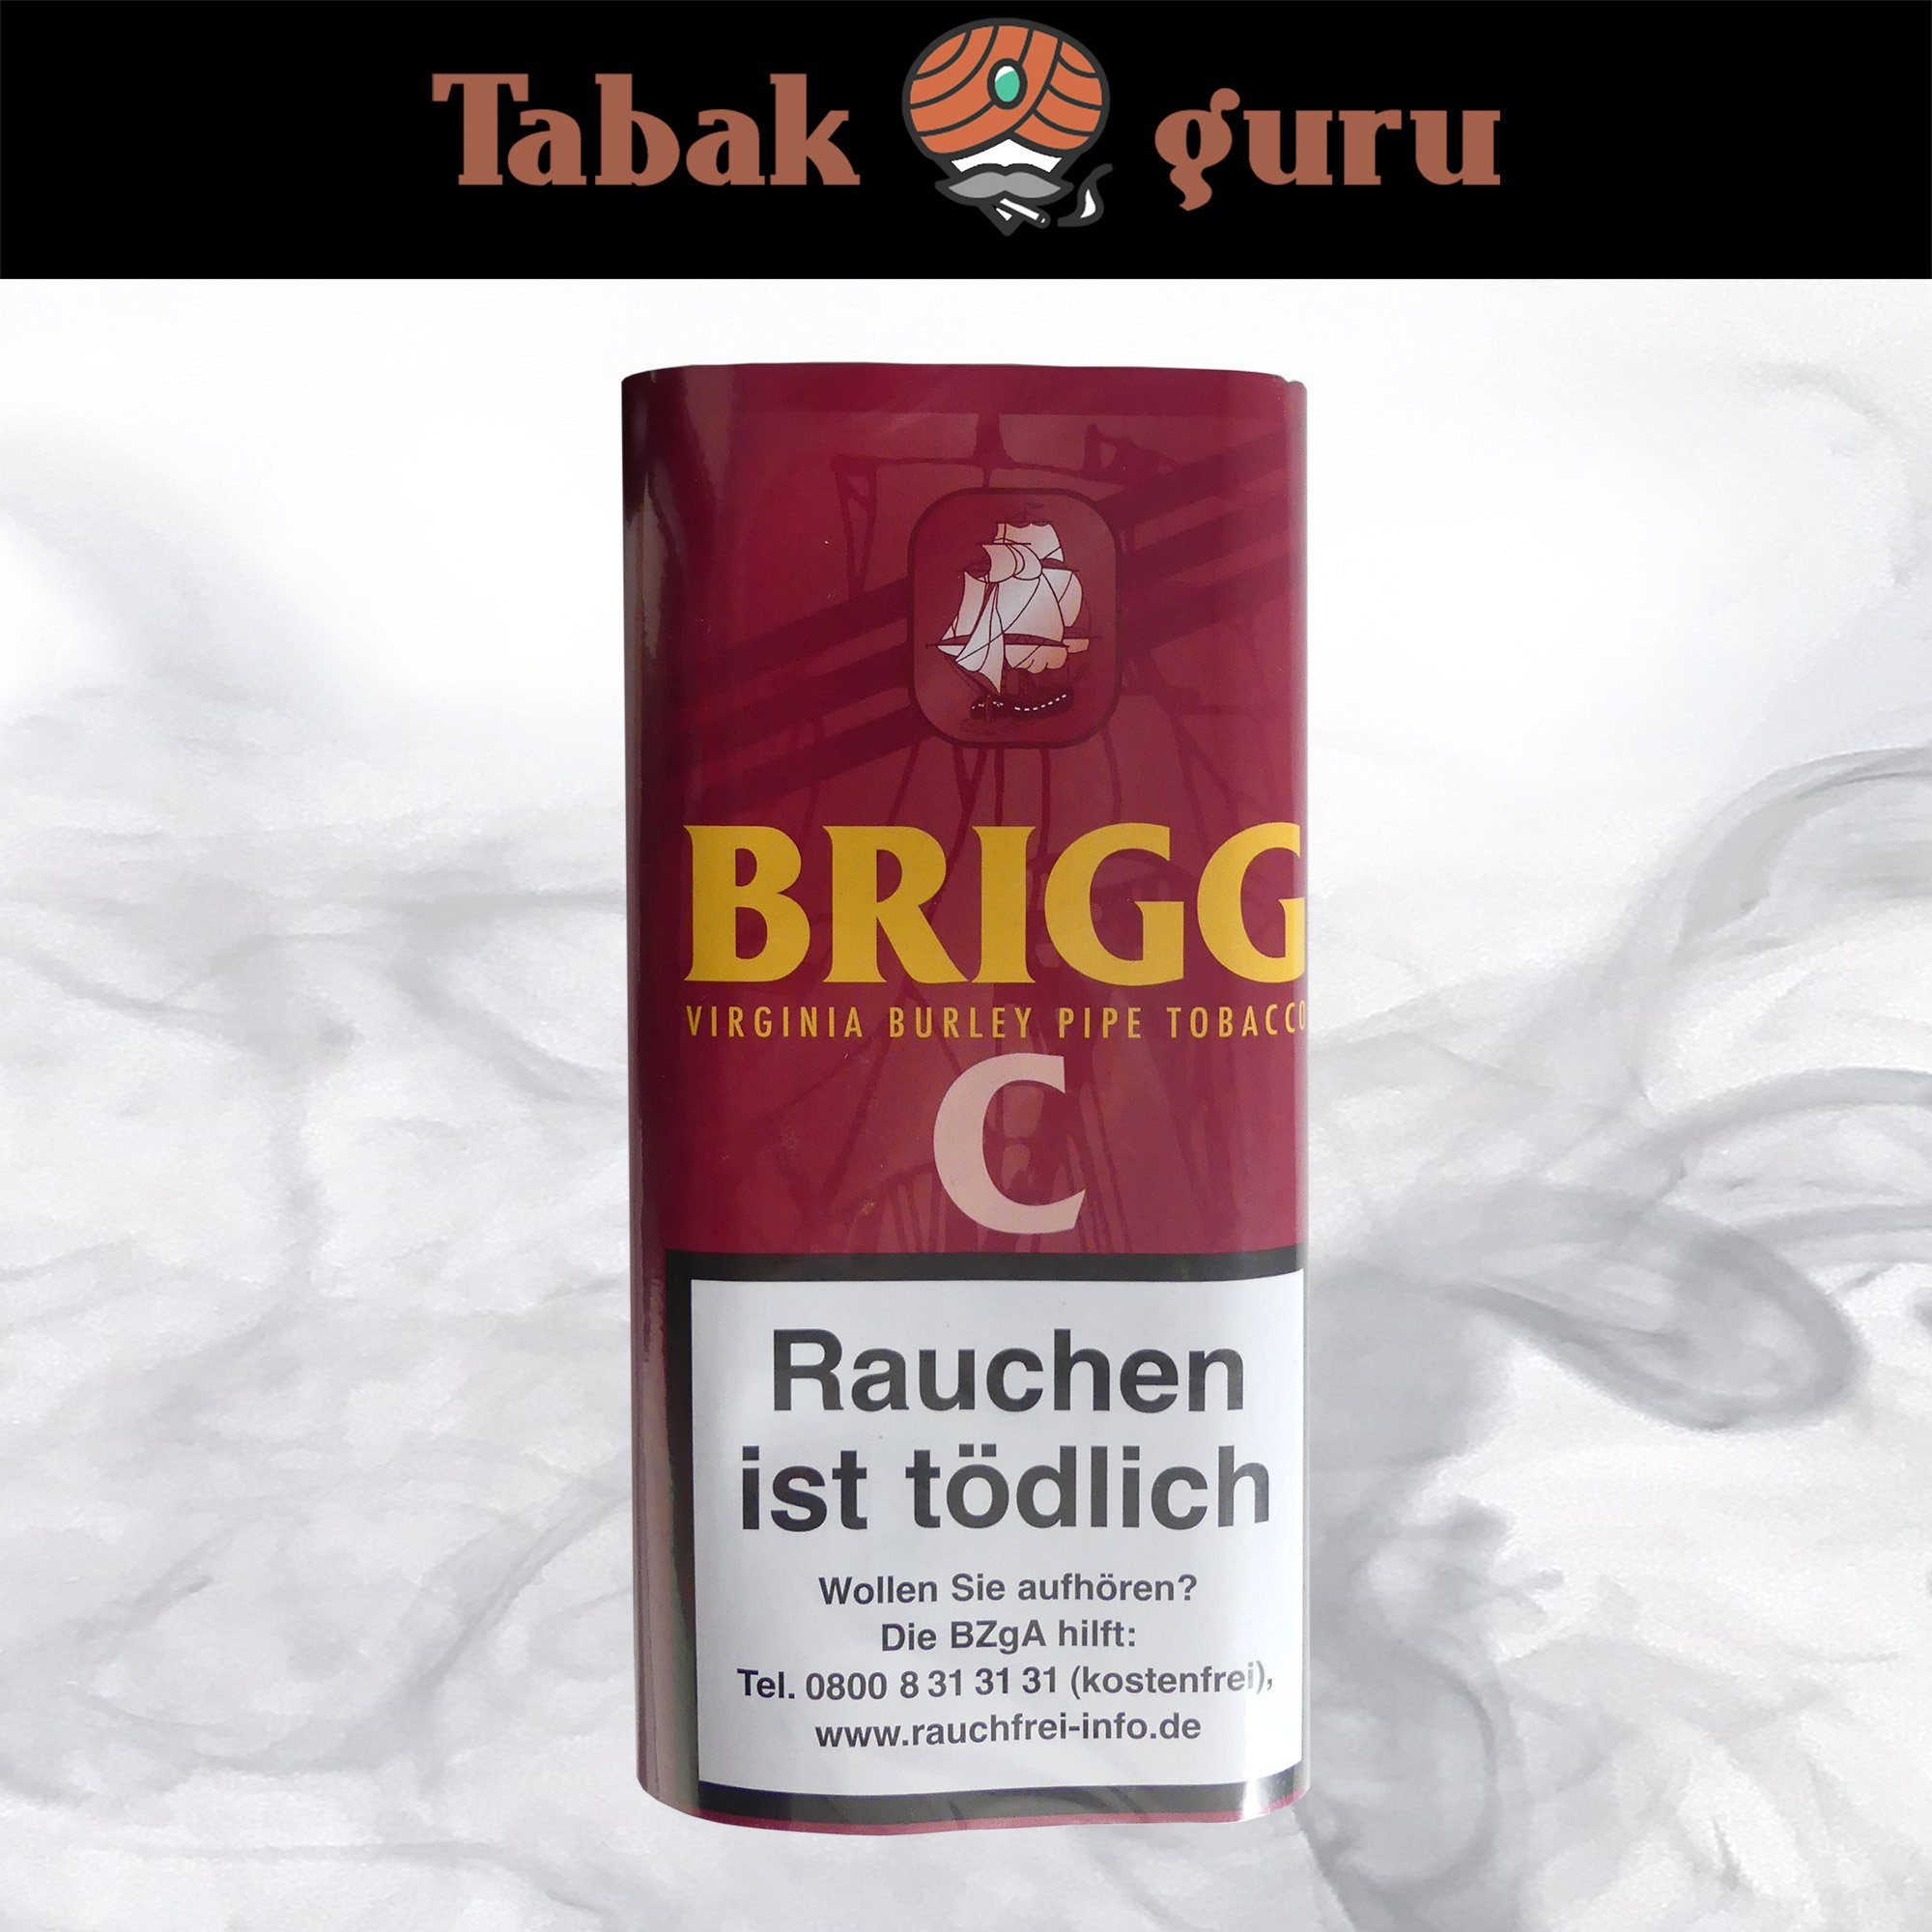 Brigg C (Cherry) Pouch 40g Pfeifentabak